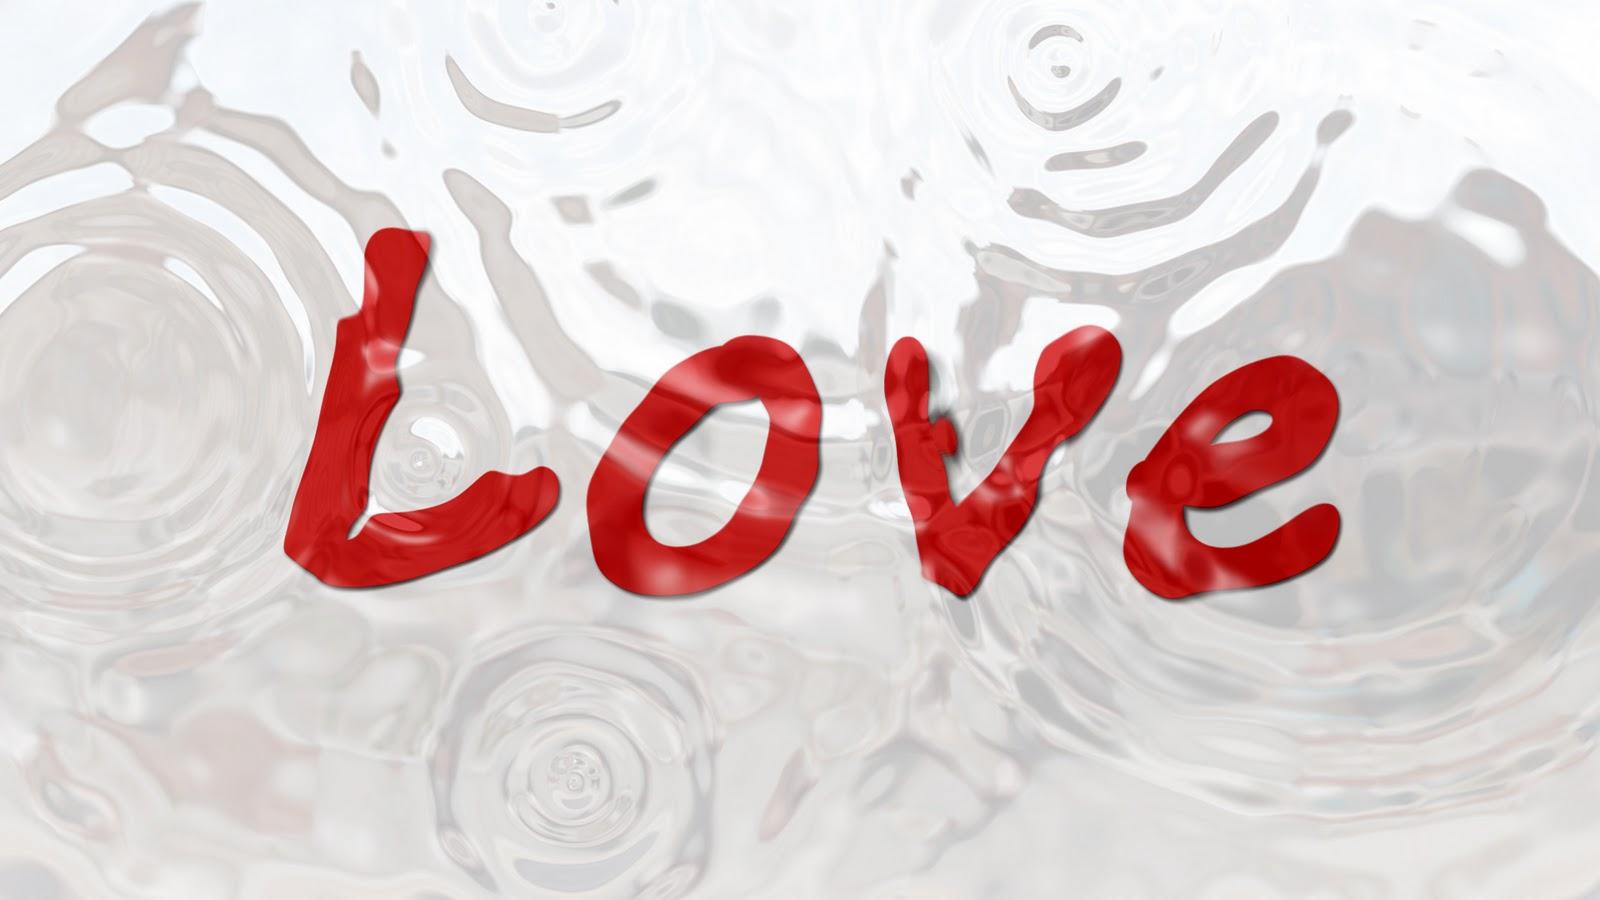 Christian Love PNG HD Transparent Christian Love HDPNG